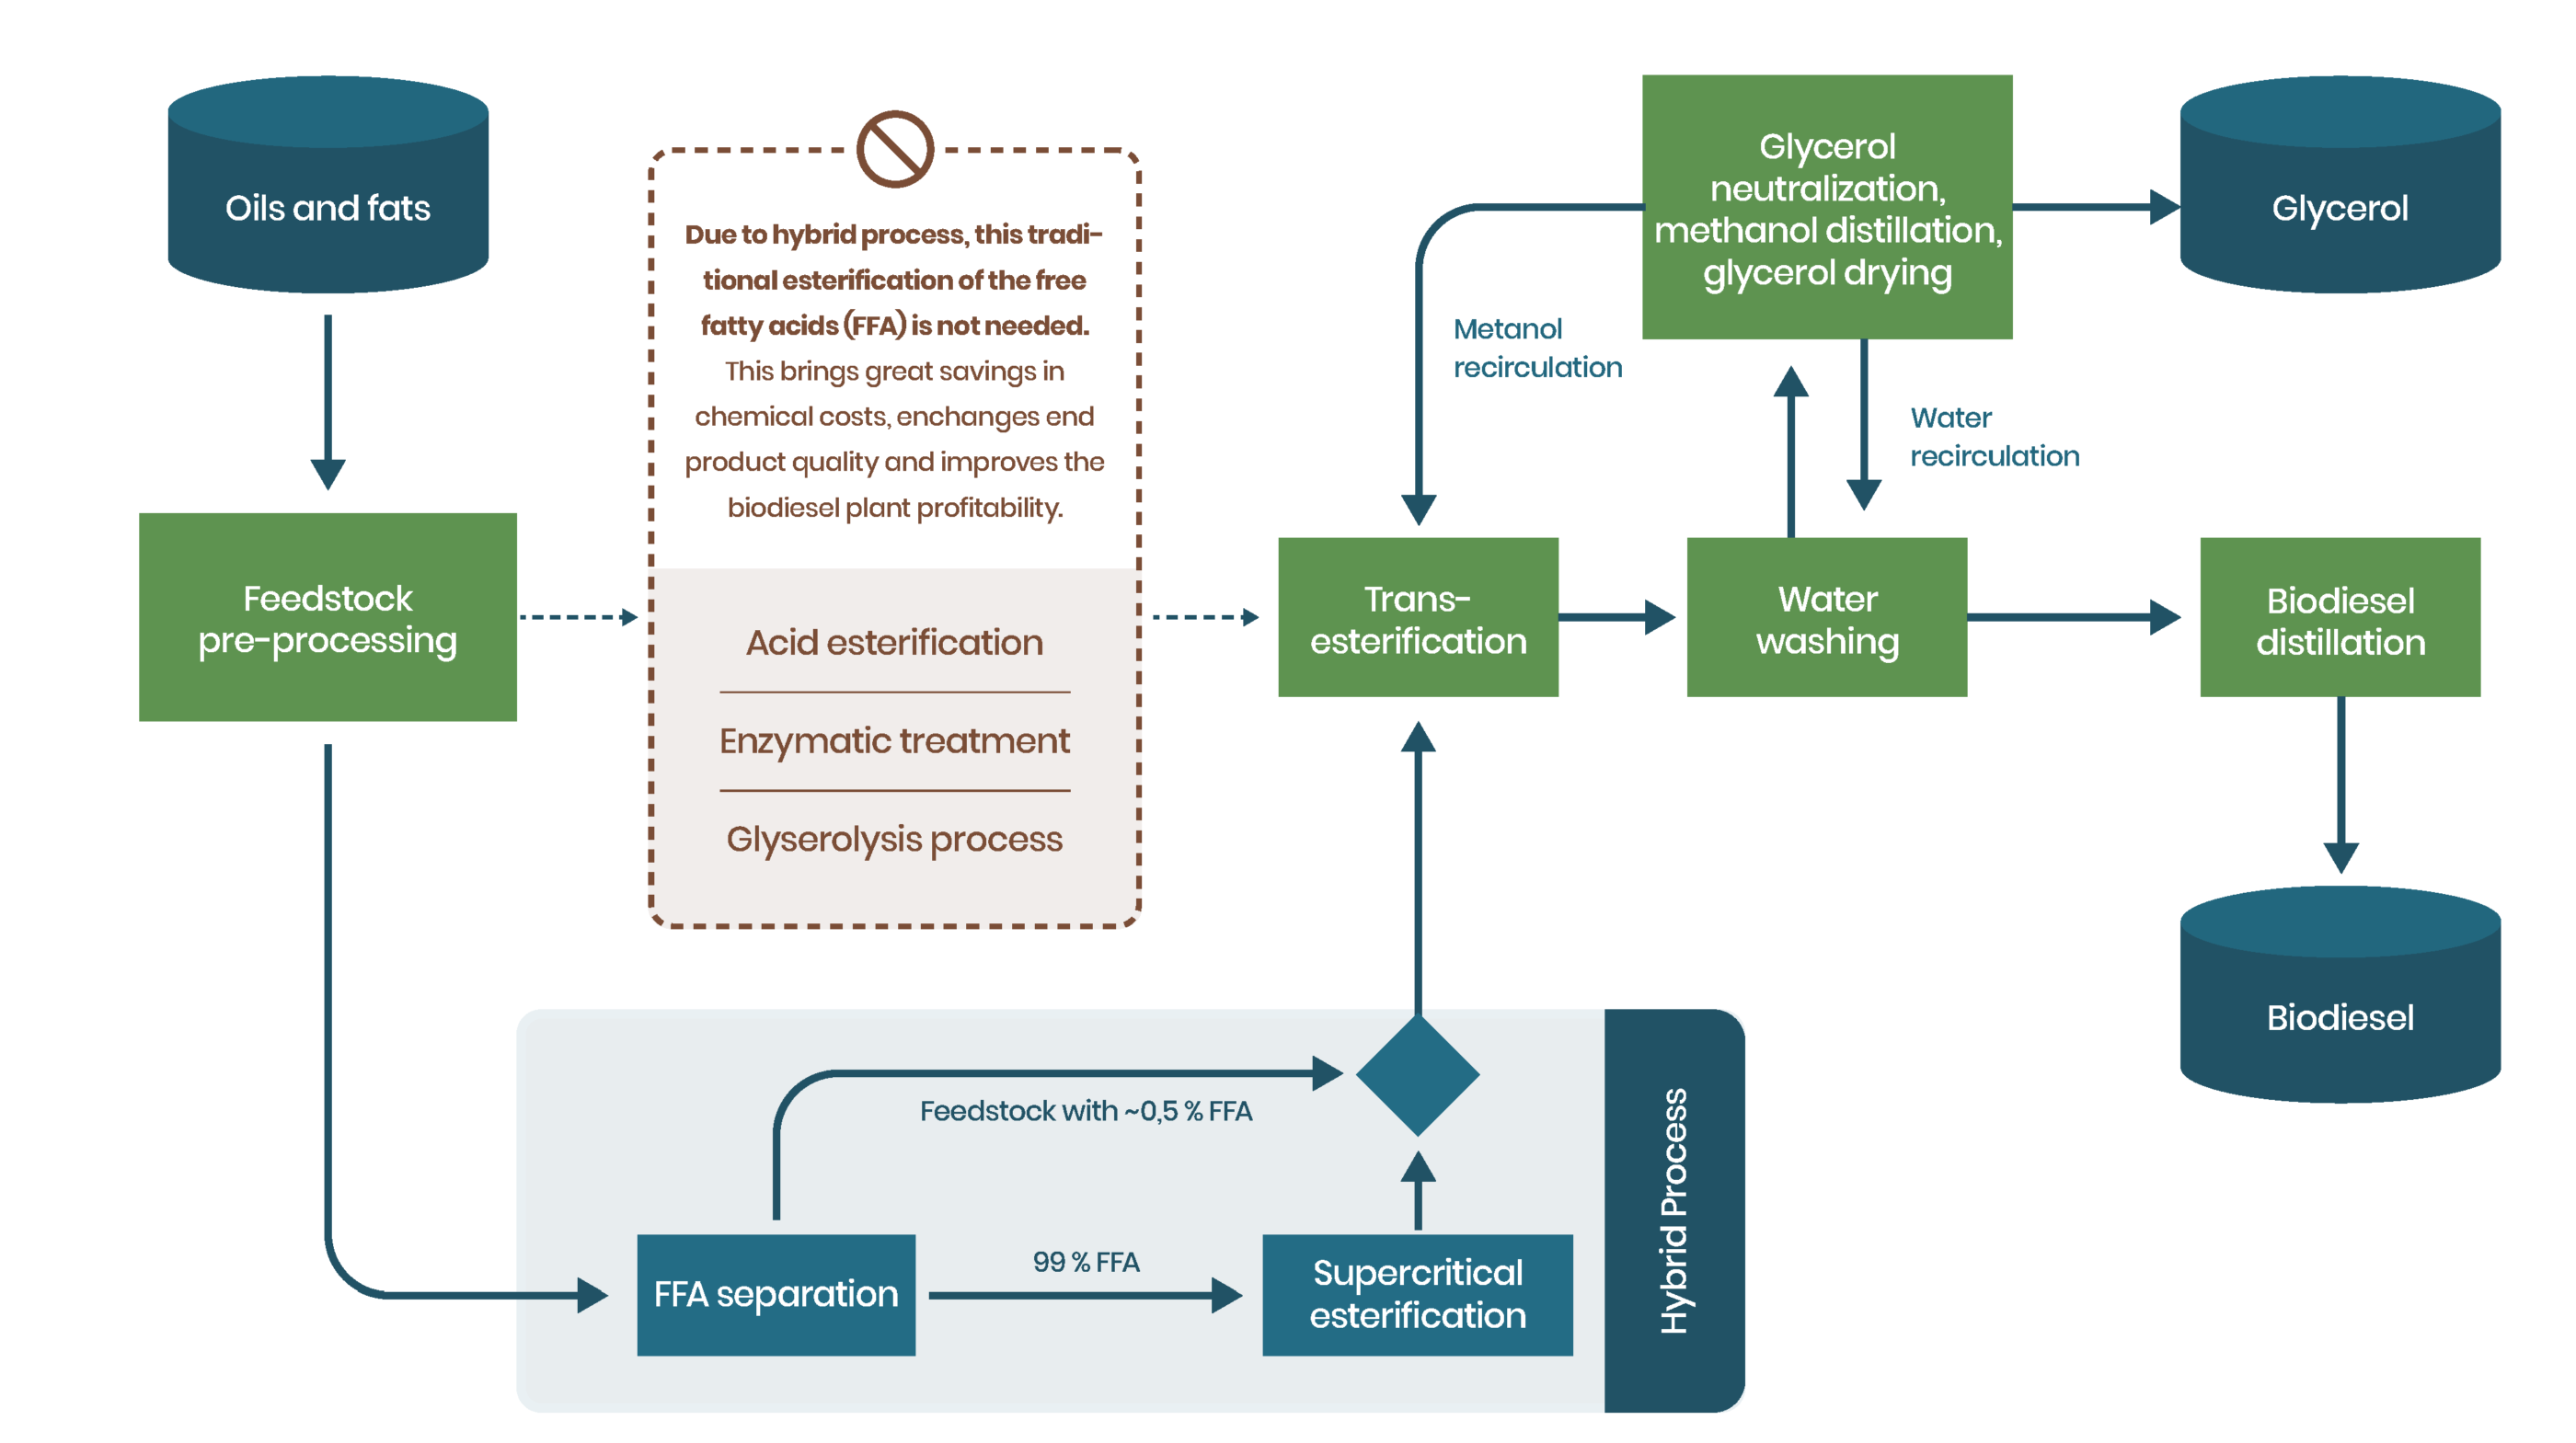 Hybrid biodiesel production flowchart.